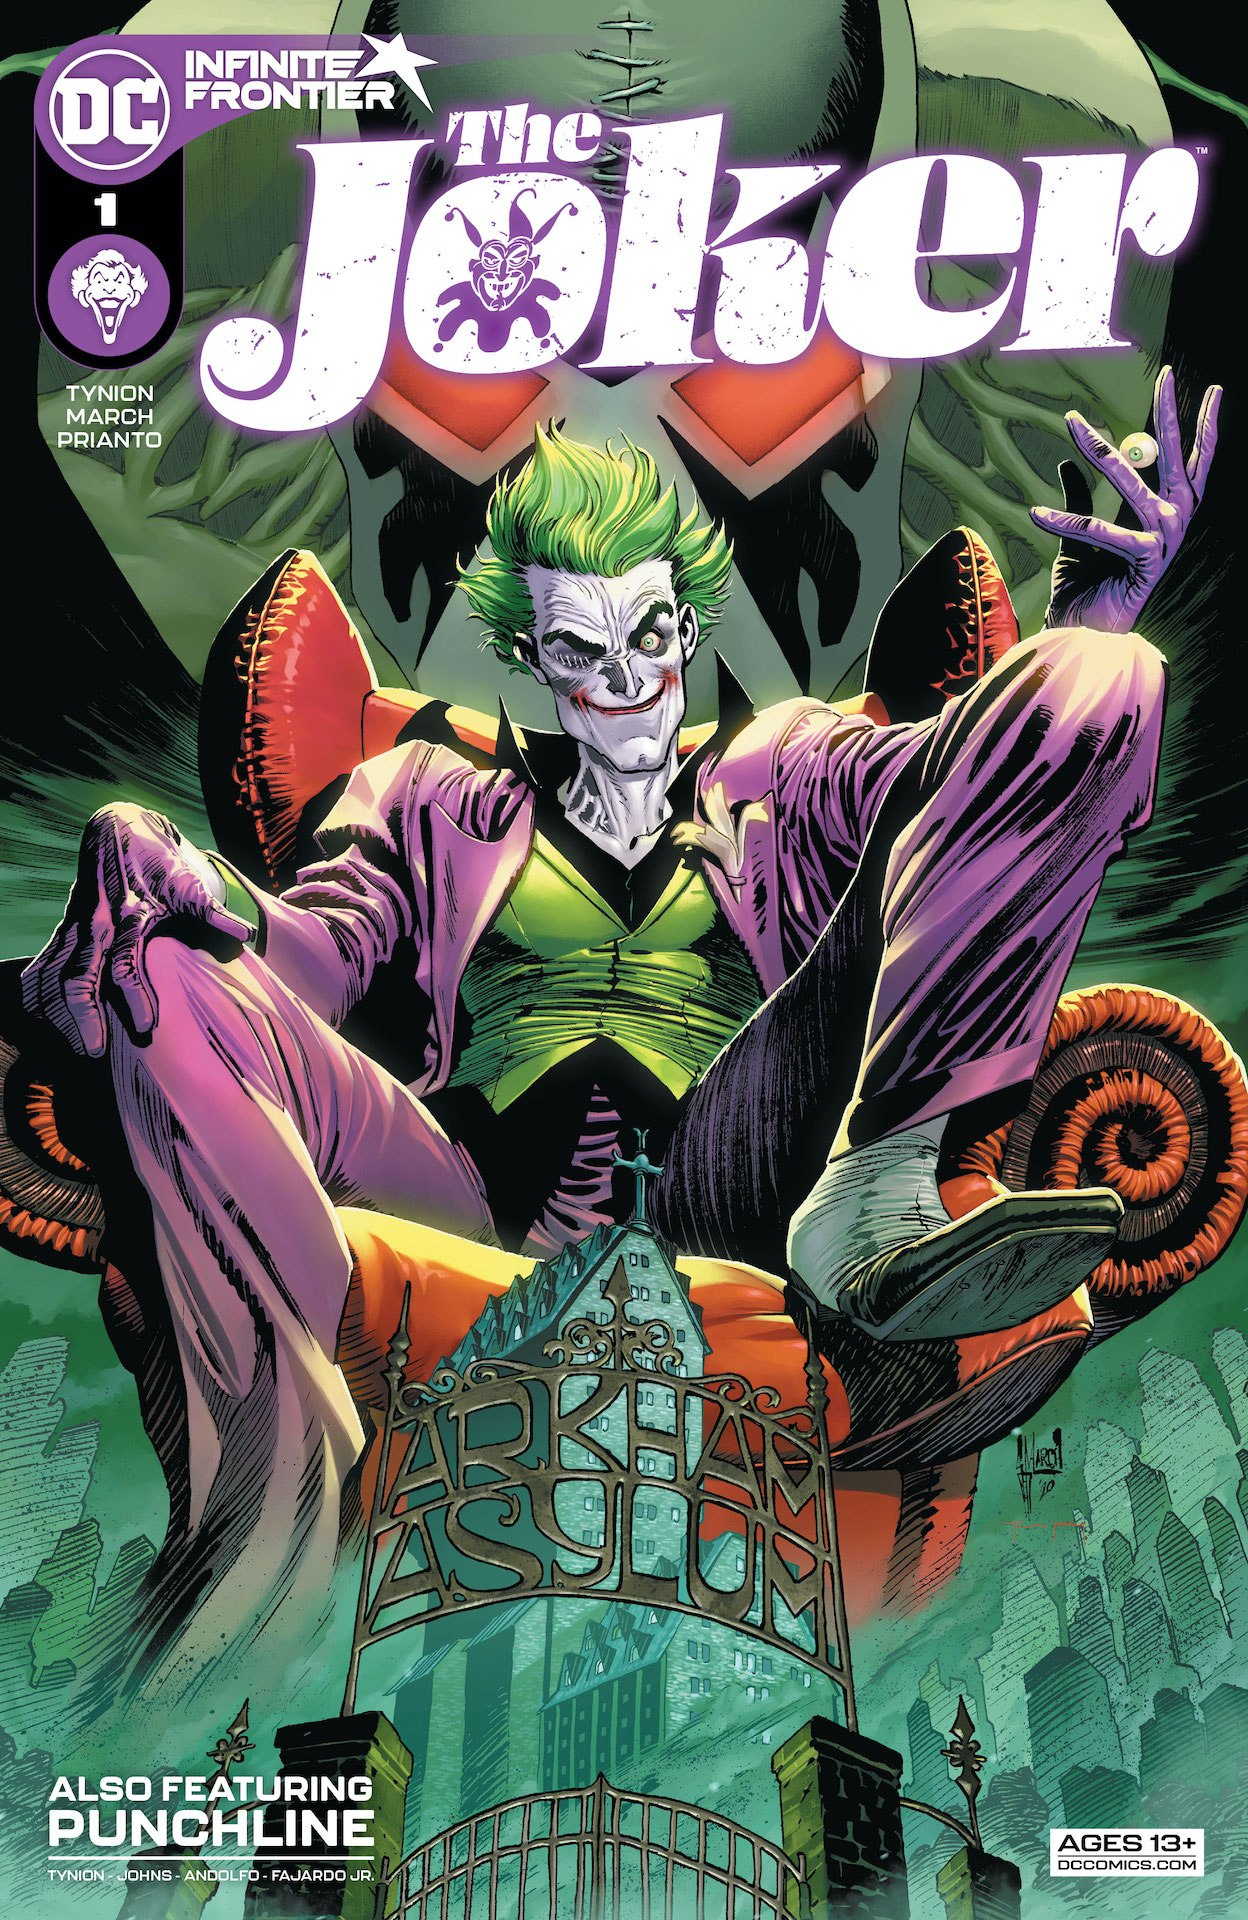 The Joker #1 preview